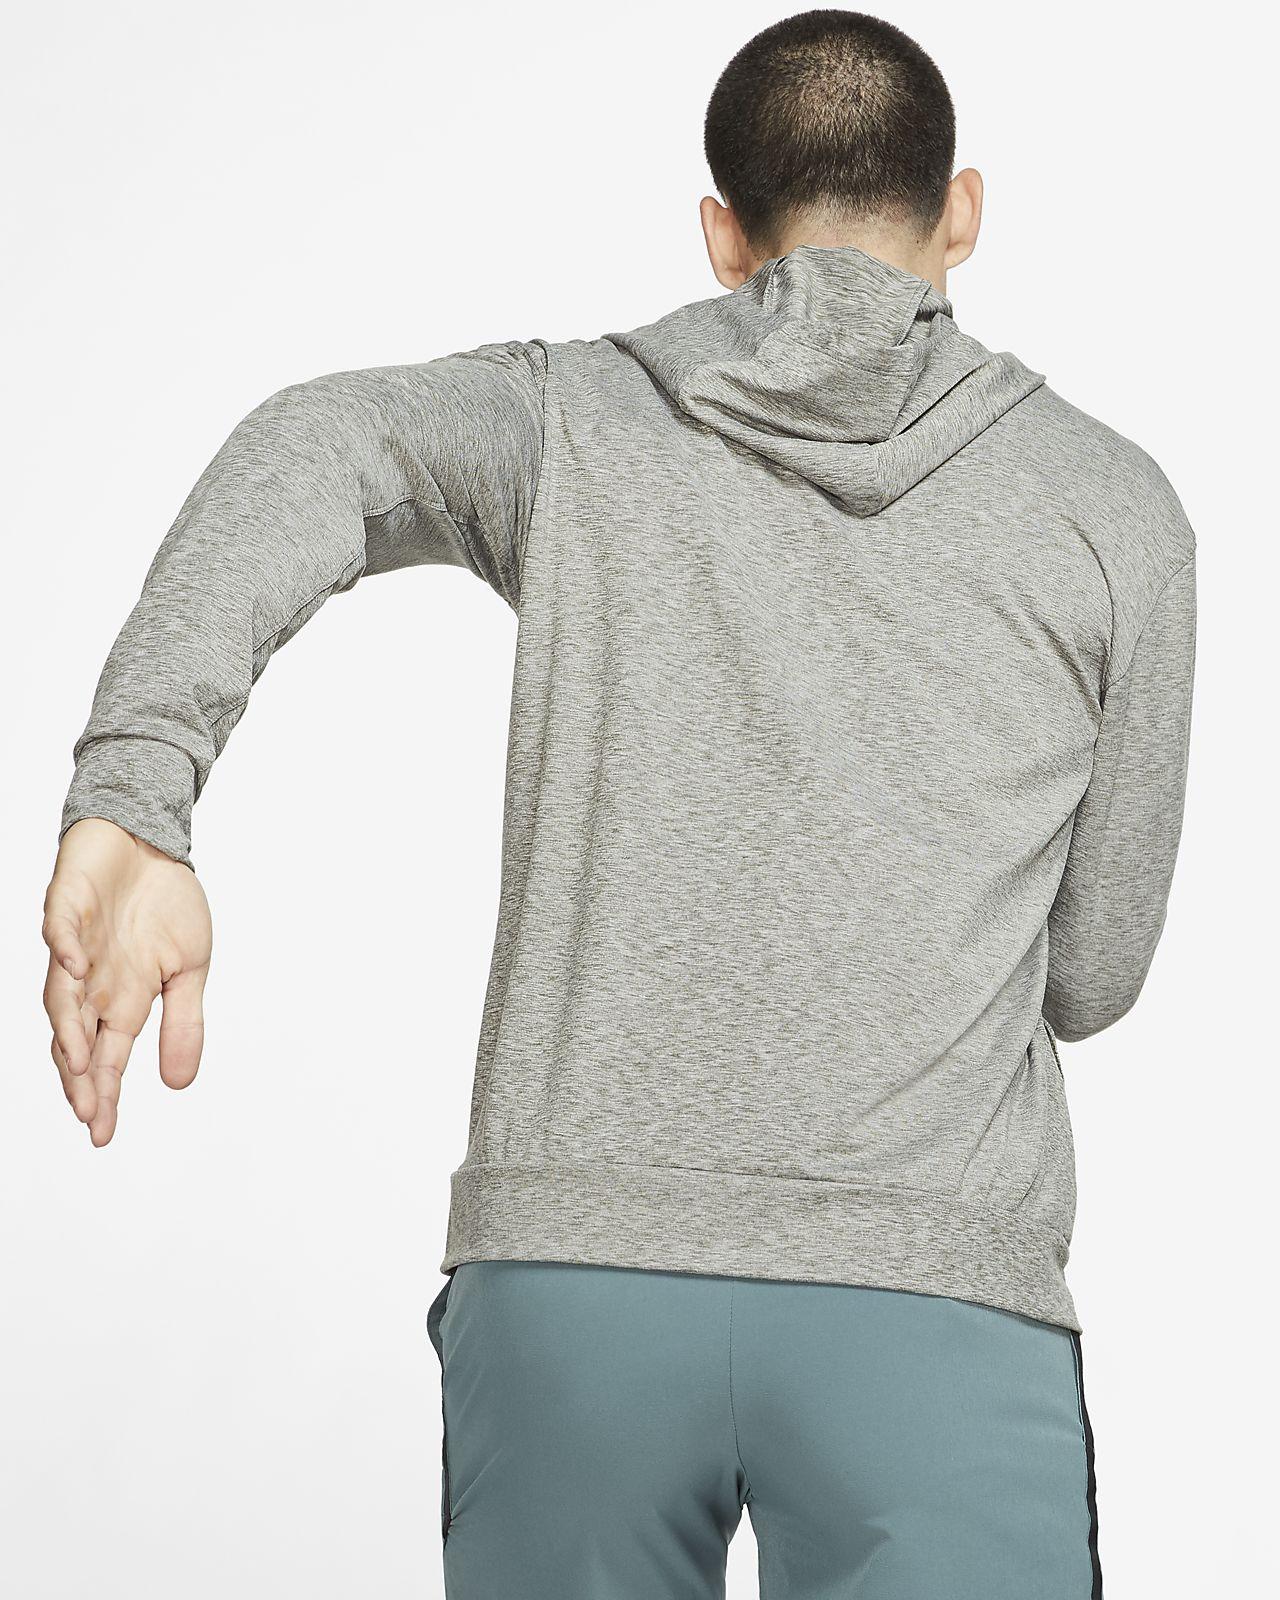 męska rozpinana bluza treningowa z kapturem nike dri-fit